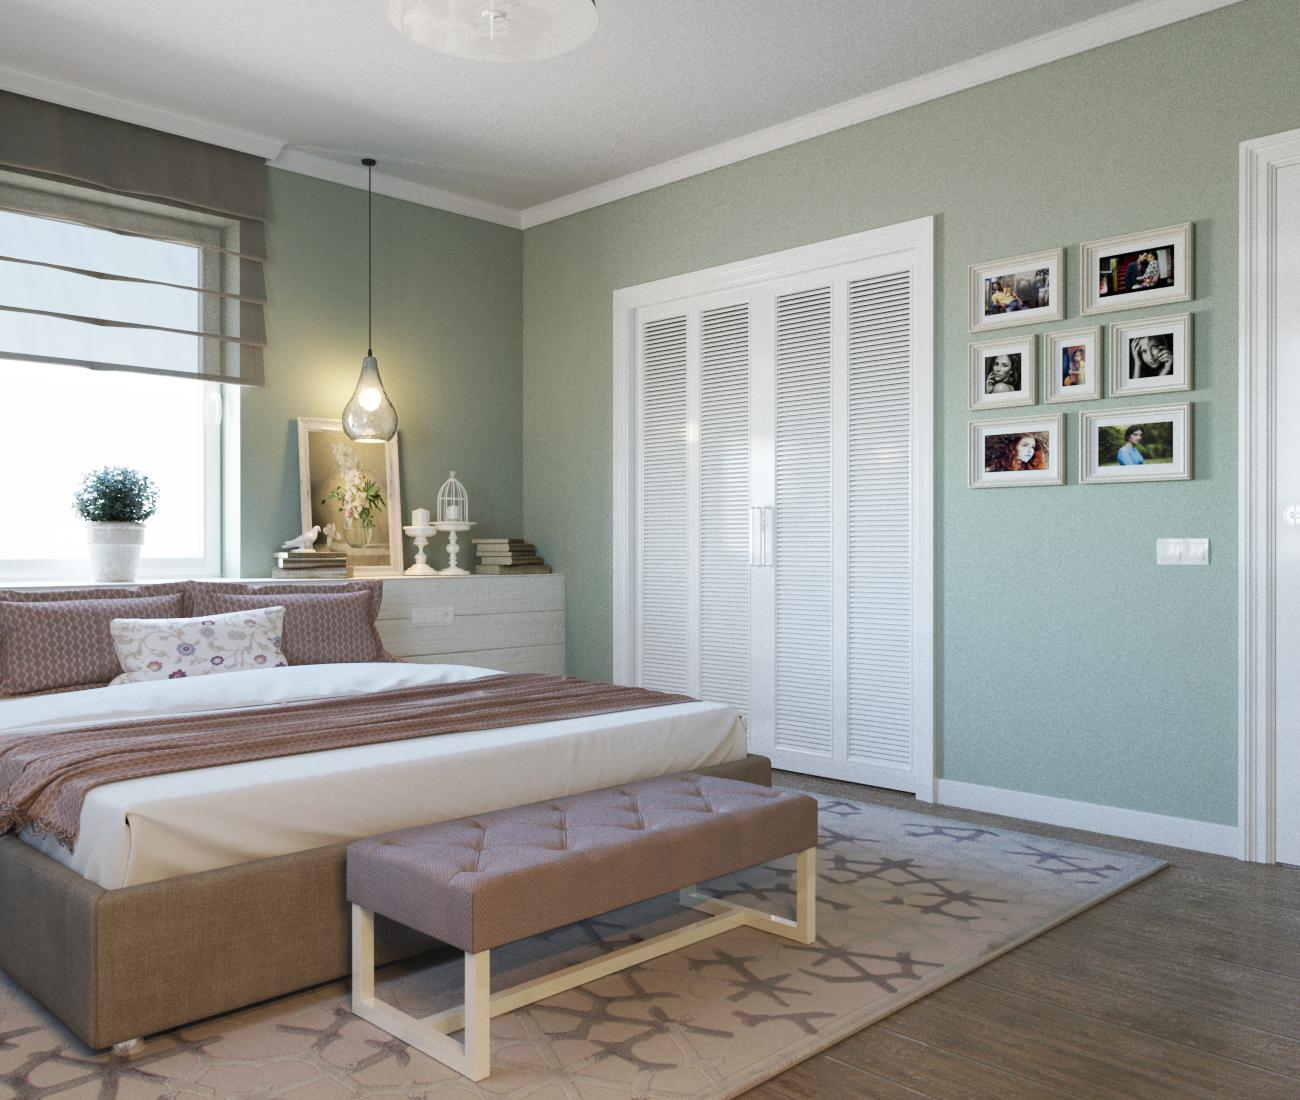 Bedroom_view_1.jpg